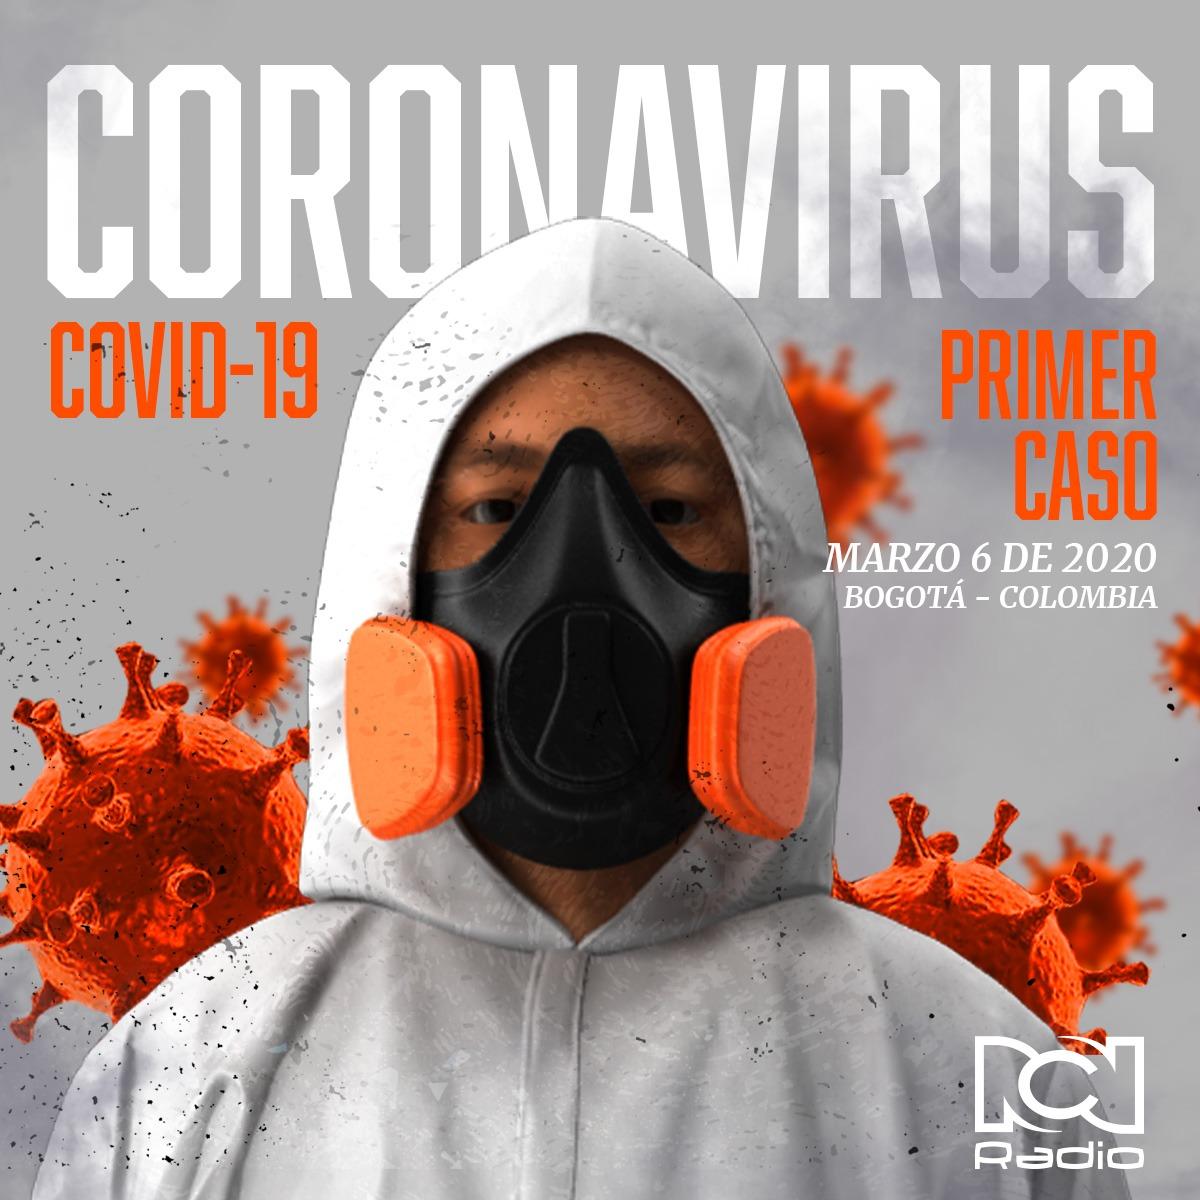 Infografía primer caso de coronavirus en Colombia